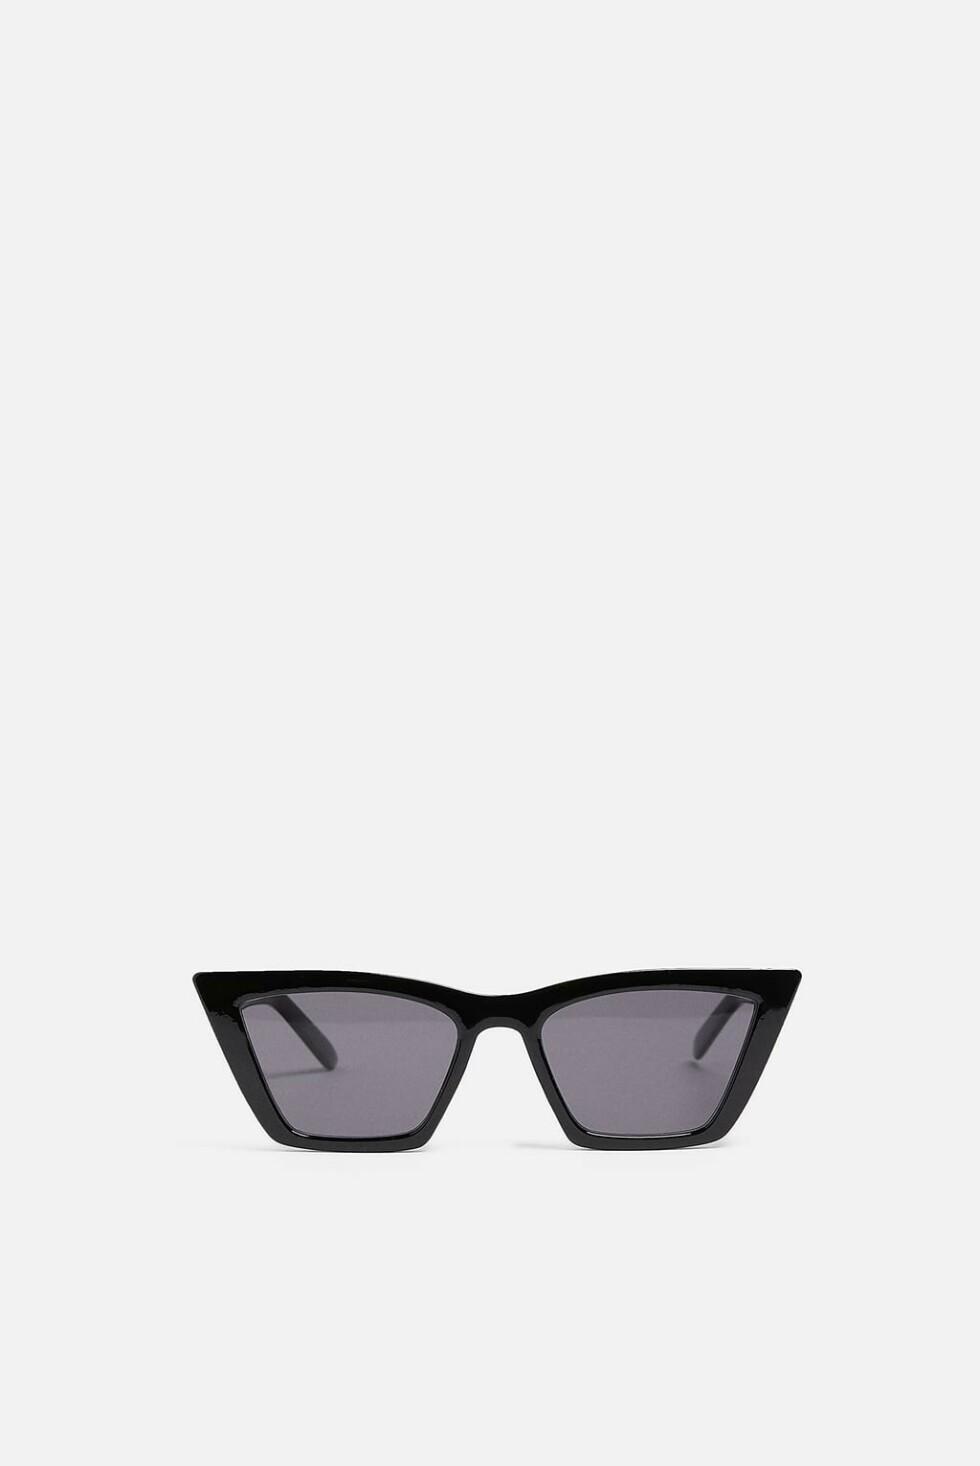 Solbriller fra Zara |199,-| https://www.zara.com/no/no/firkantede-cat-eye-solbriller-p01903002.html?v1=8086645&v2=1180464